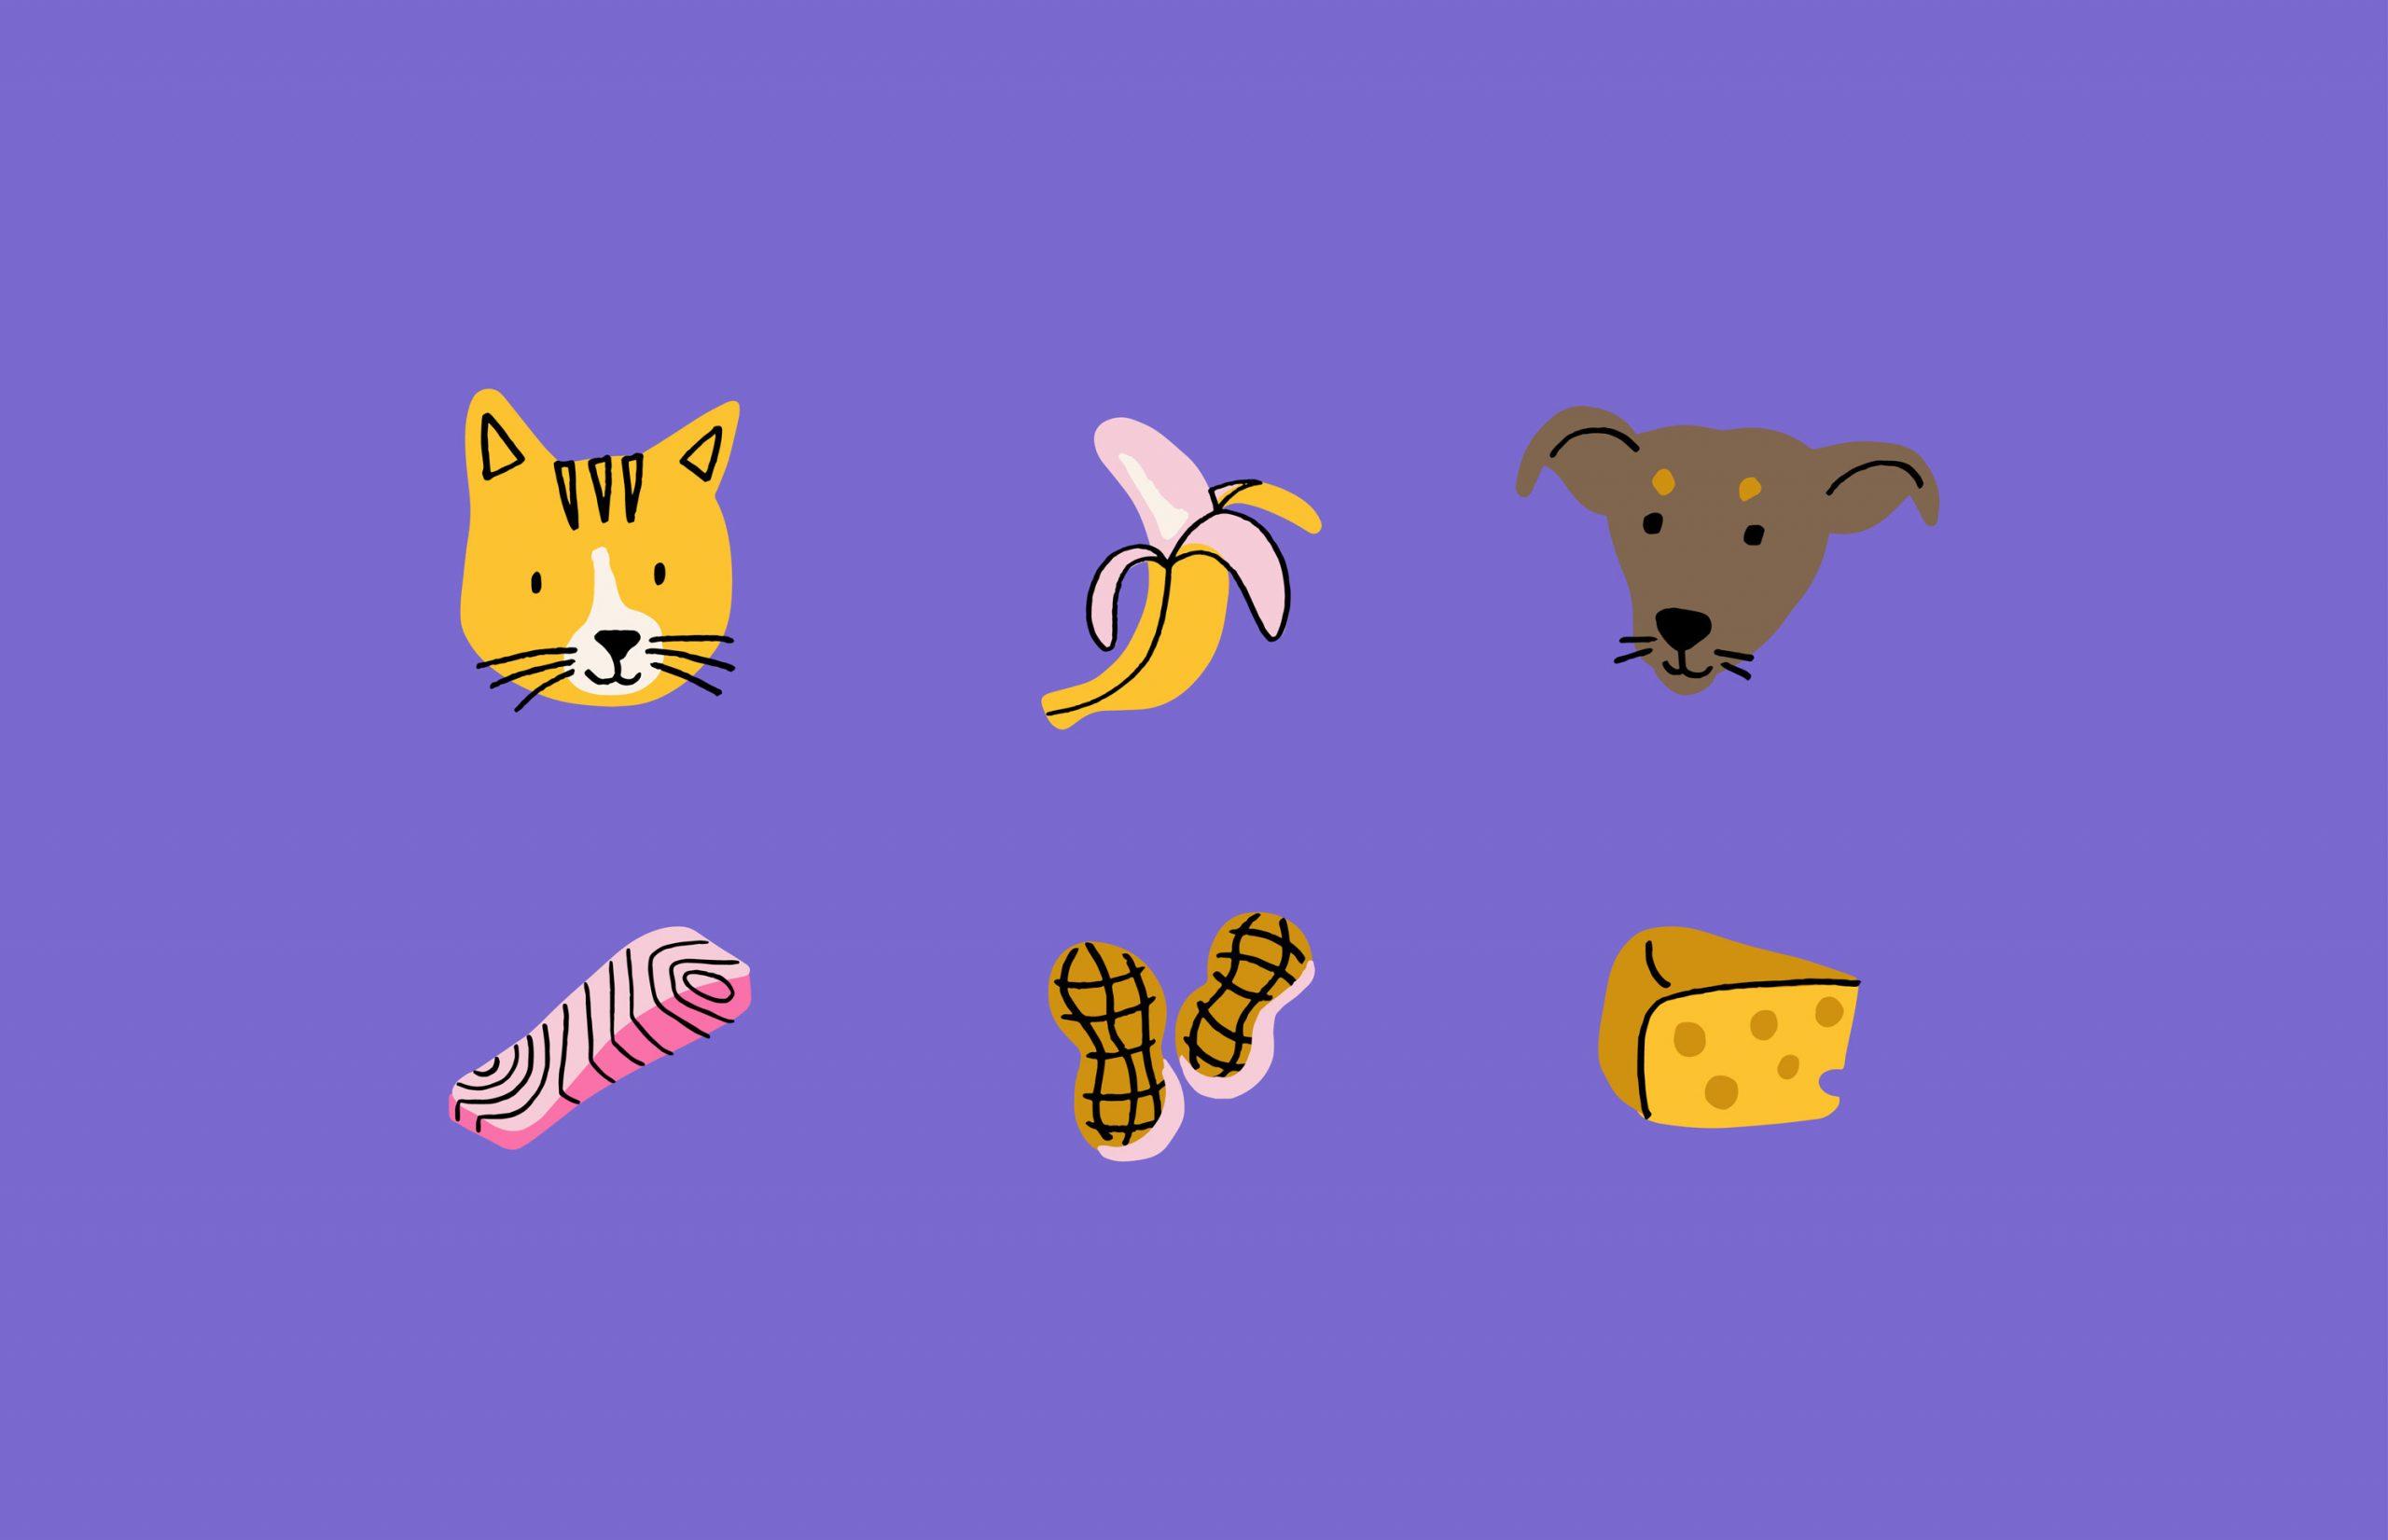 dog icon, cat icon, food icon